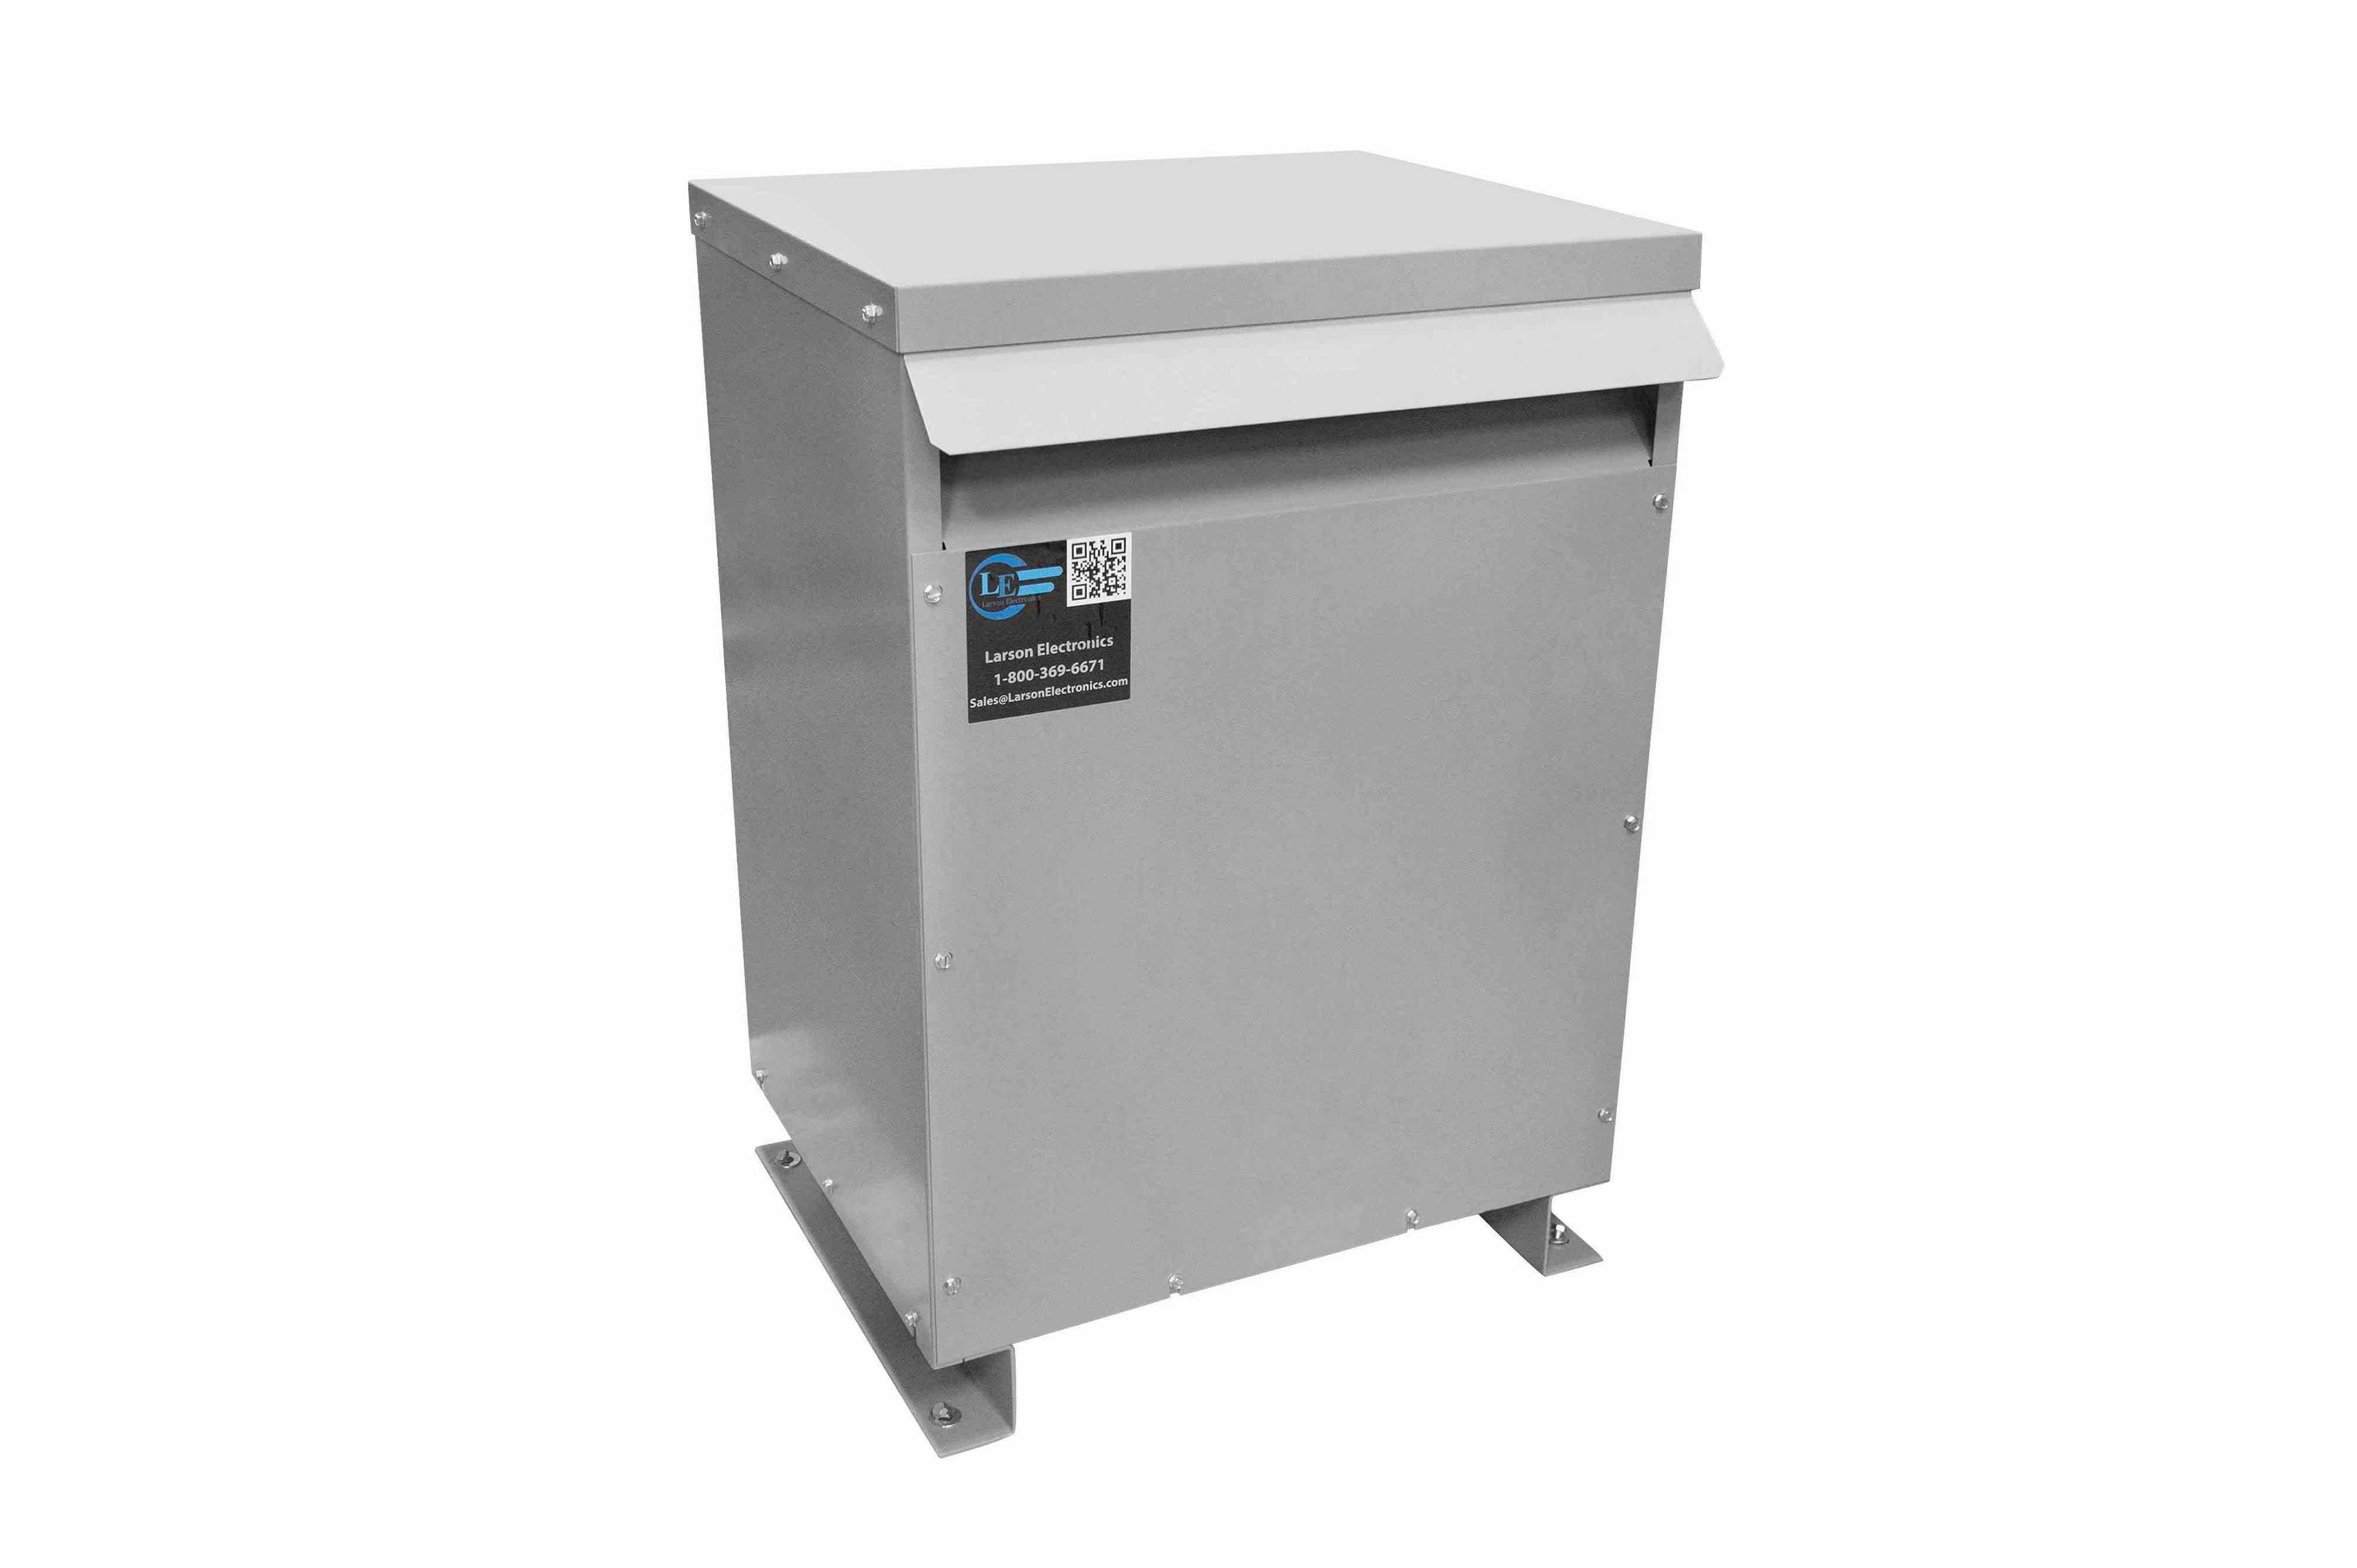 700 kVA 3PH Isolation Transformer, 480V Wye Primary, 480V Delta Secondary, N3R, Ventilated, 60 Hz